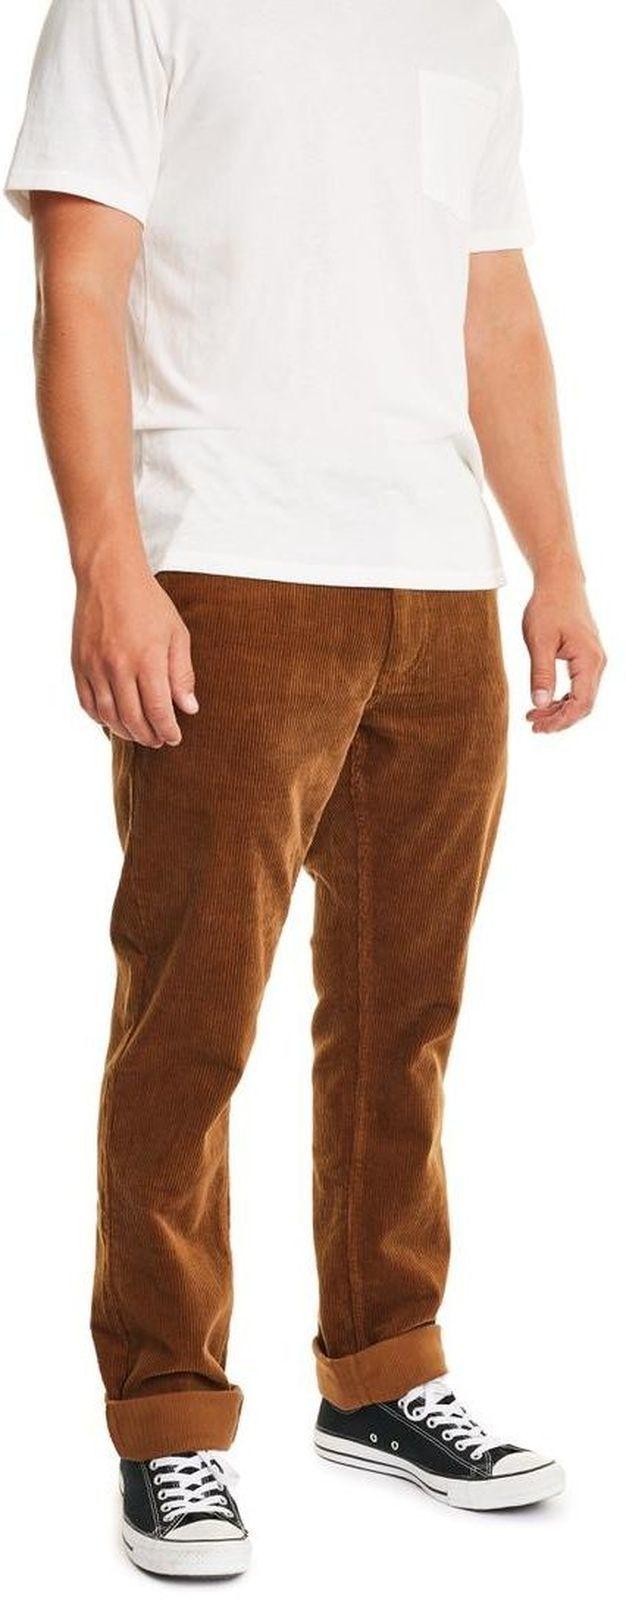 spodnie męskie BRIXTON RESERVE CHINO LIMITED PANT Bison